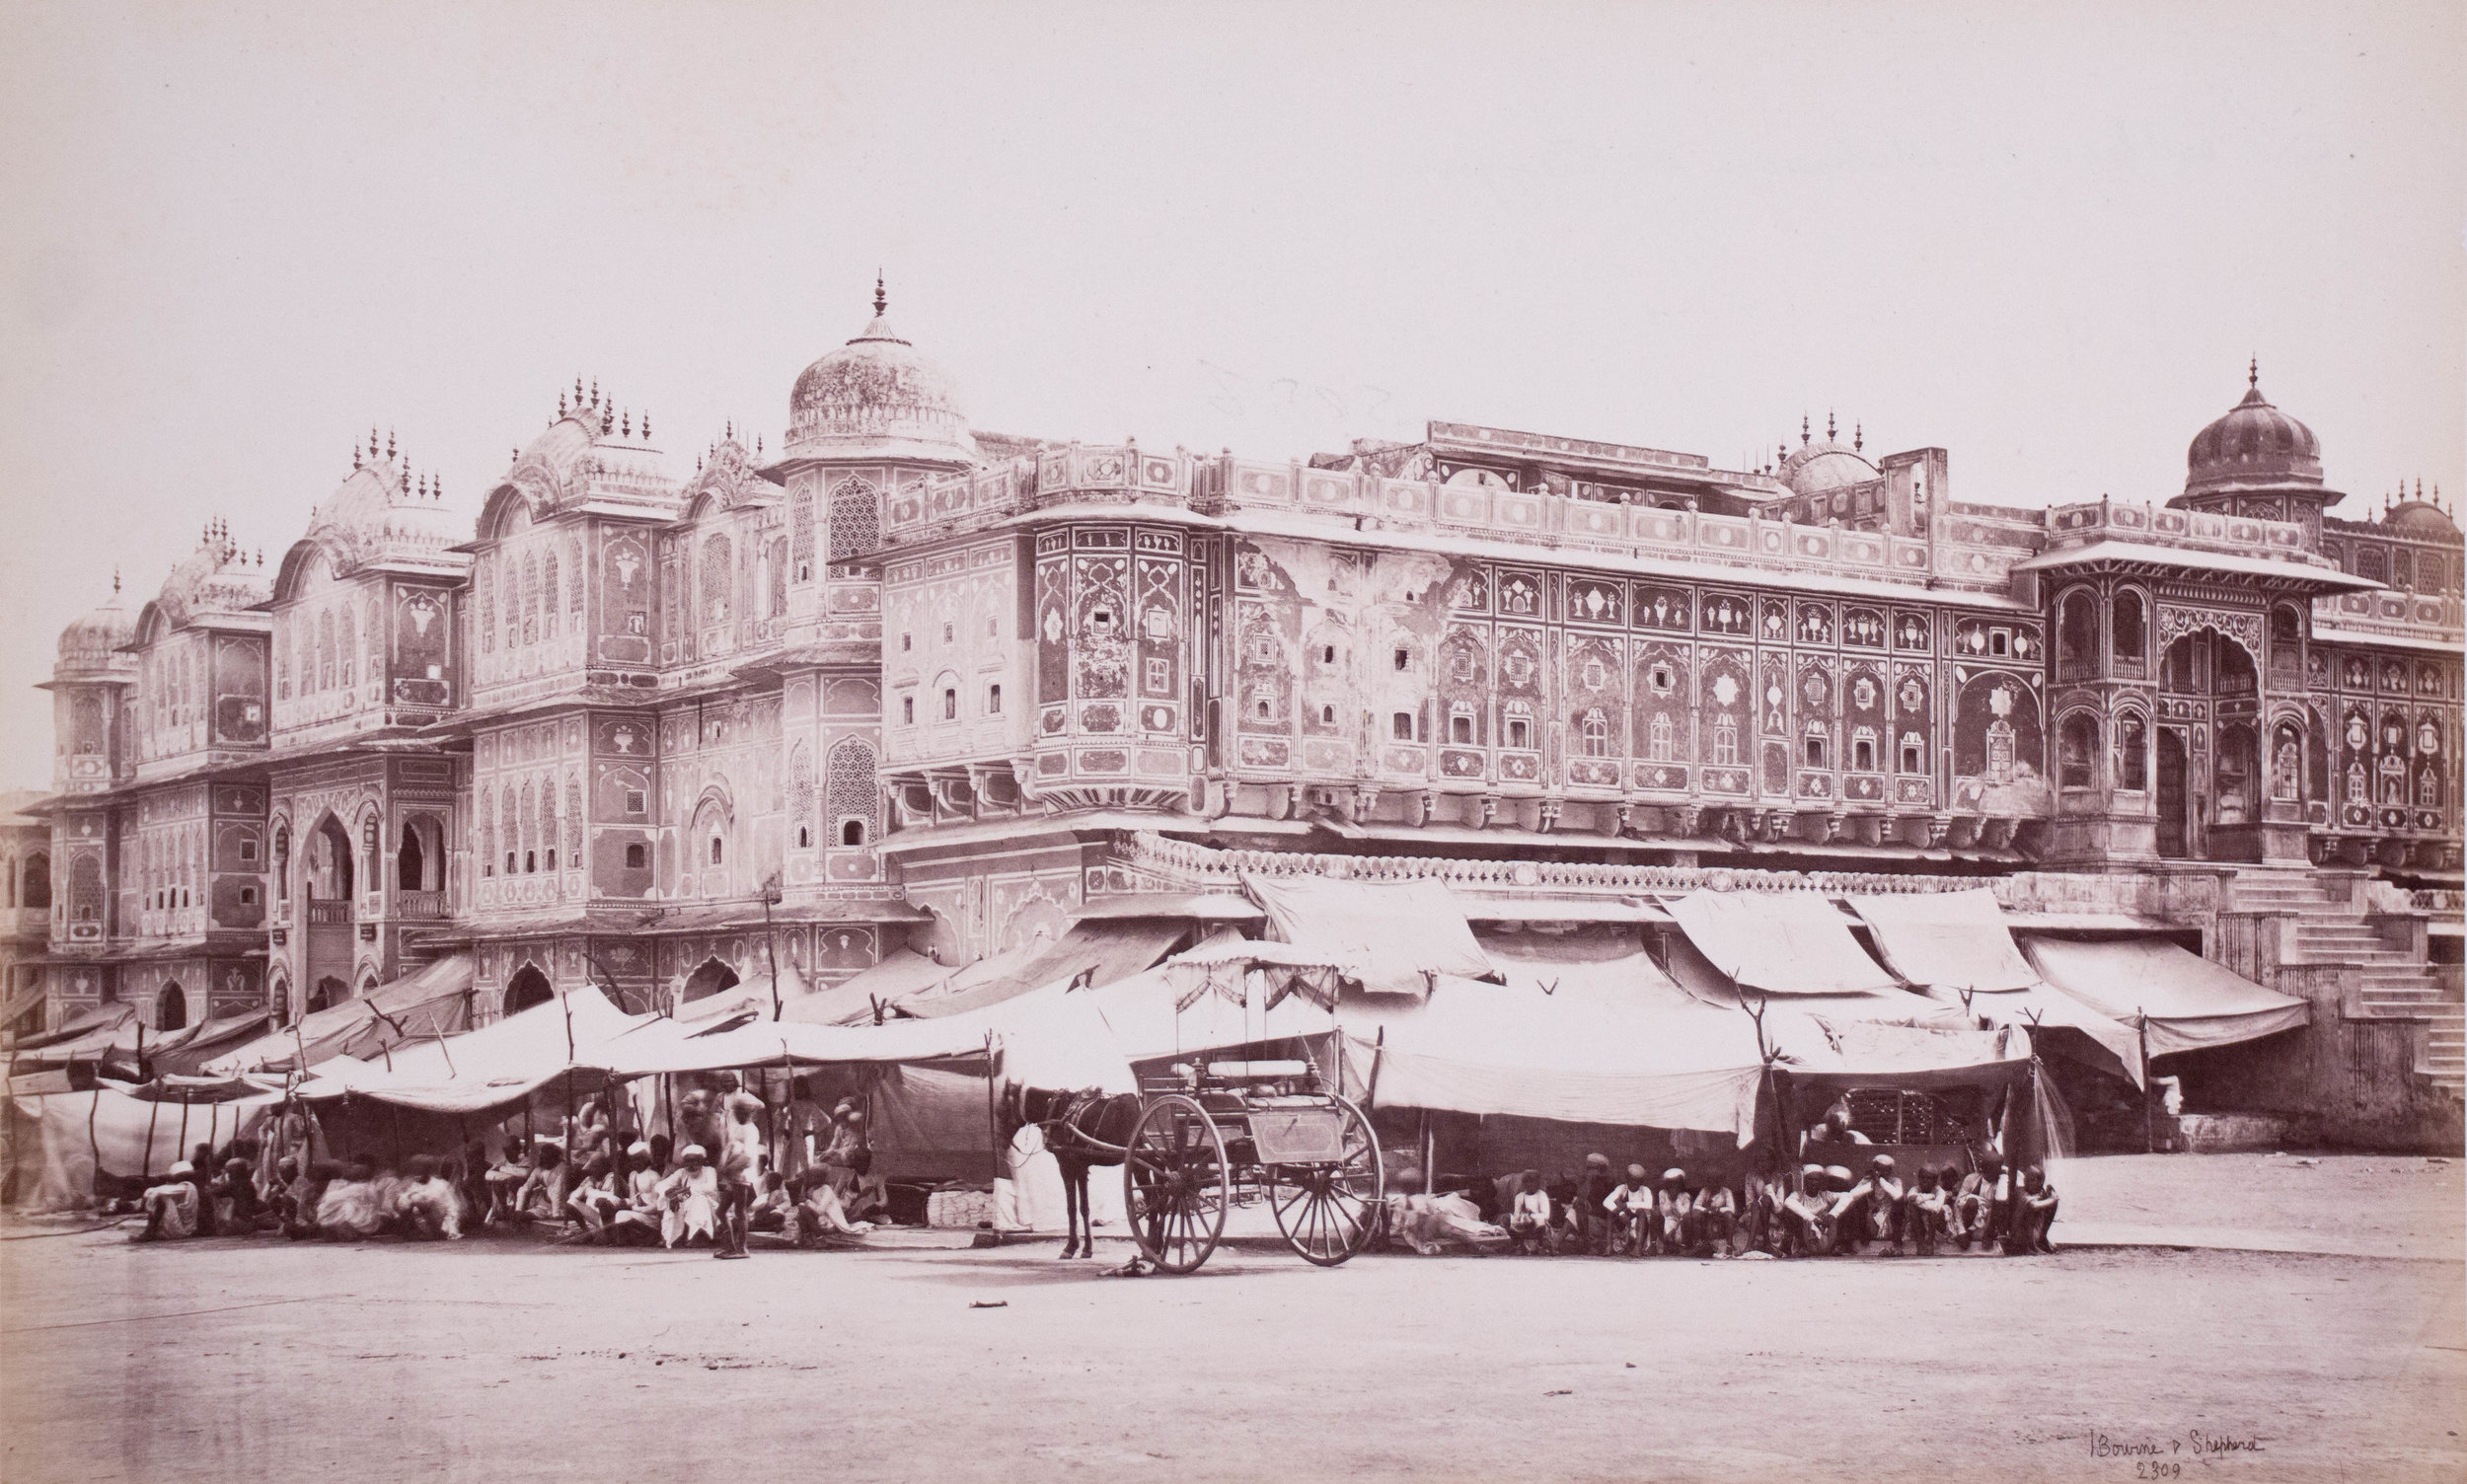 Maharaja's college, Jaipur